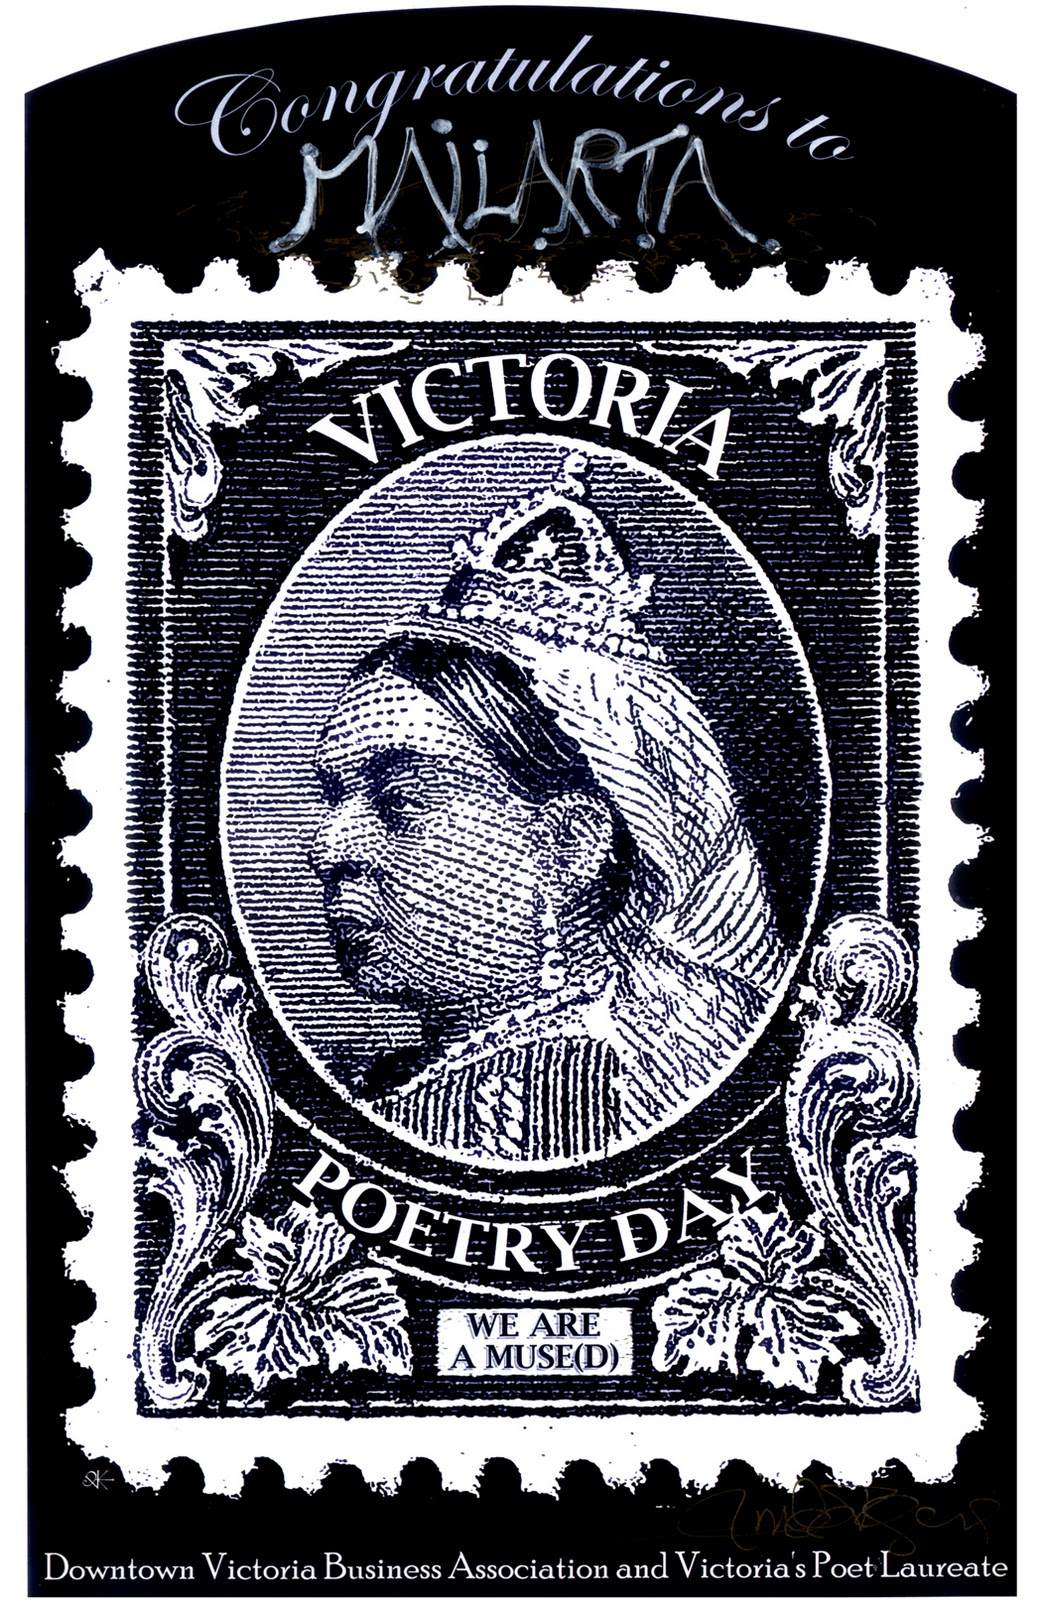 Mailarta Queen of Poste: Linda Rogers, Victoria, BC